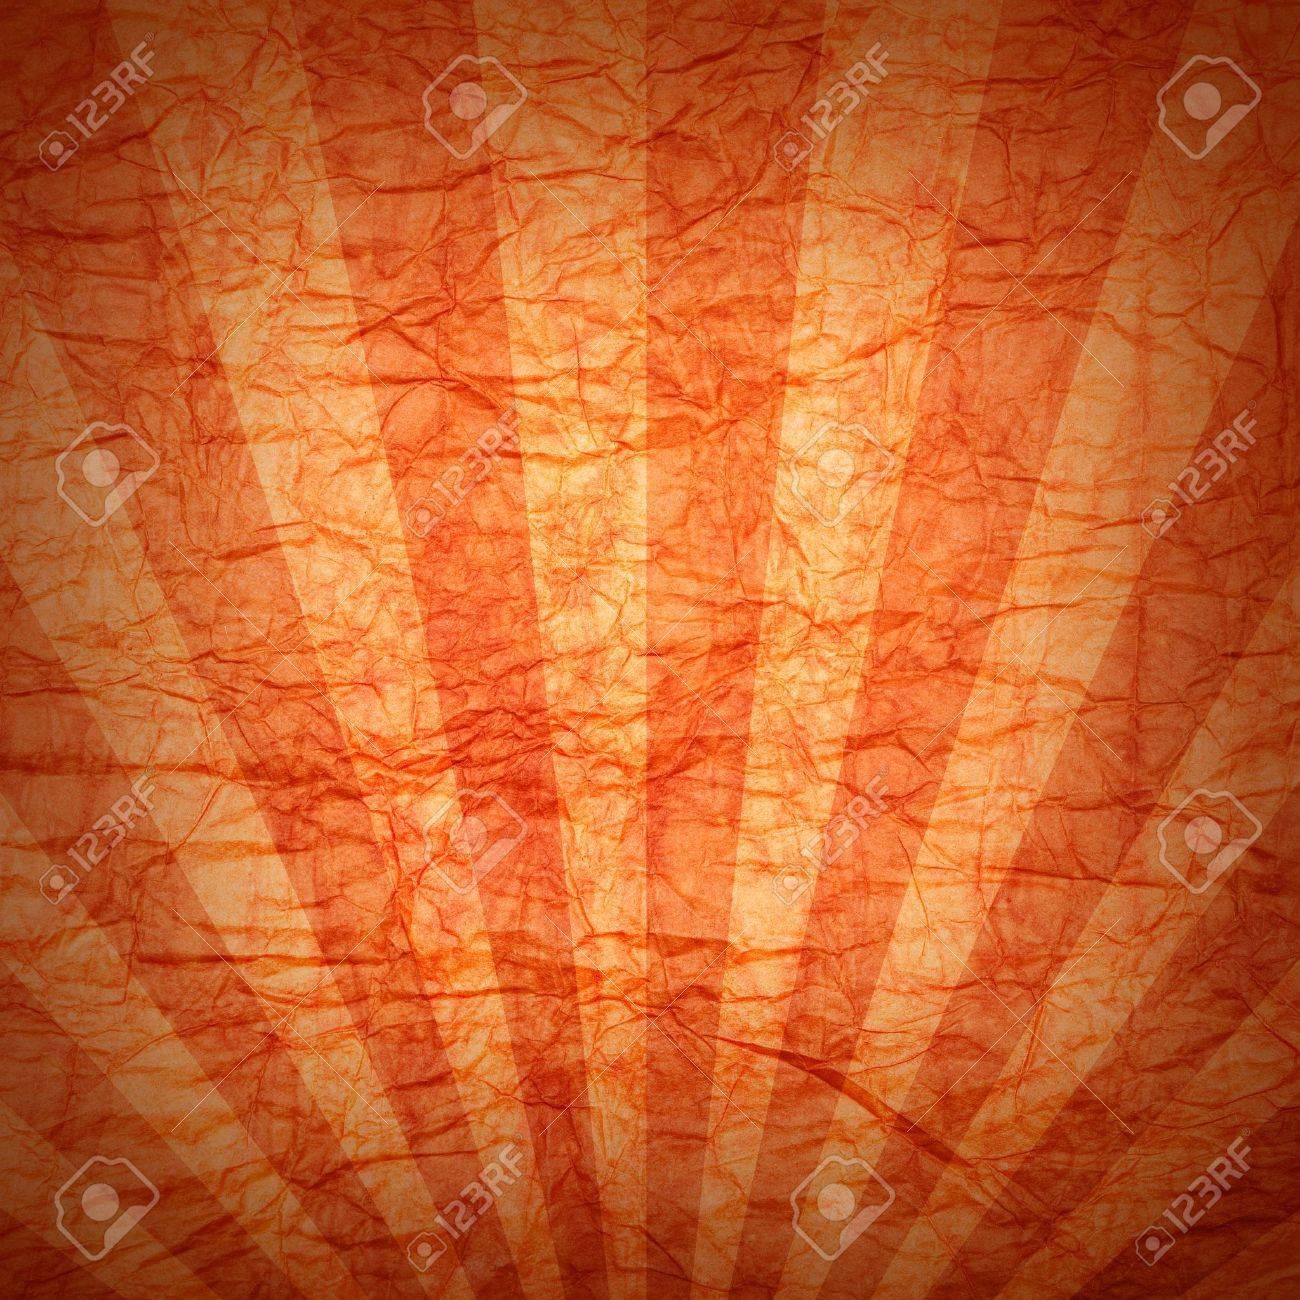 Orange background - crumpled paper Stock Photo - 10472158